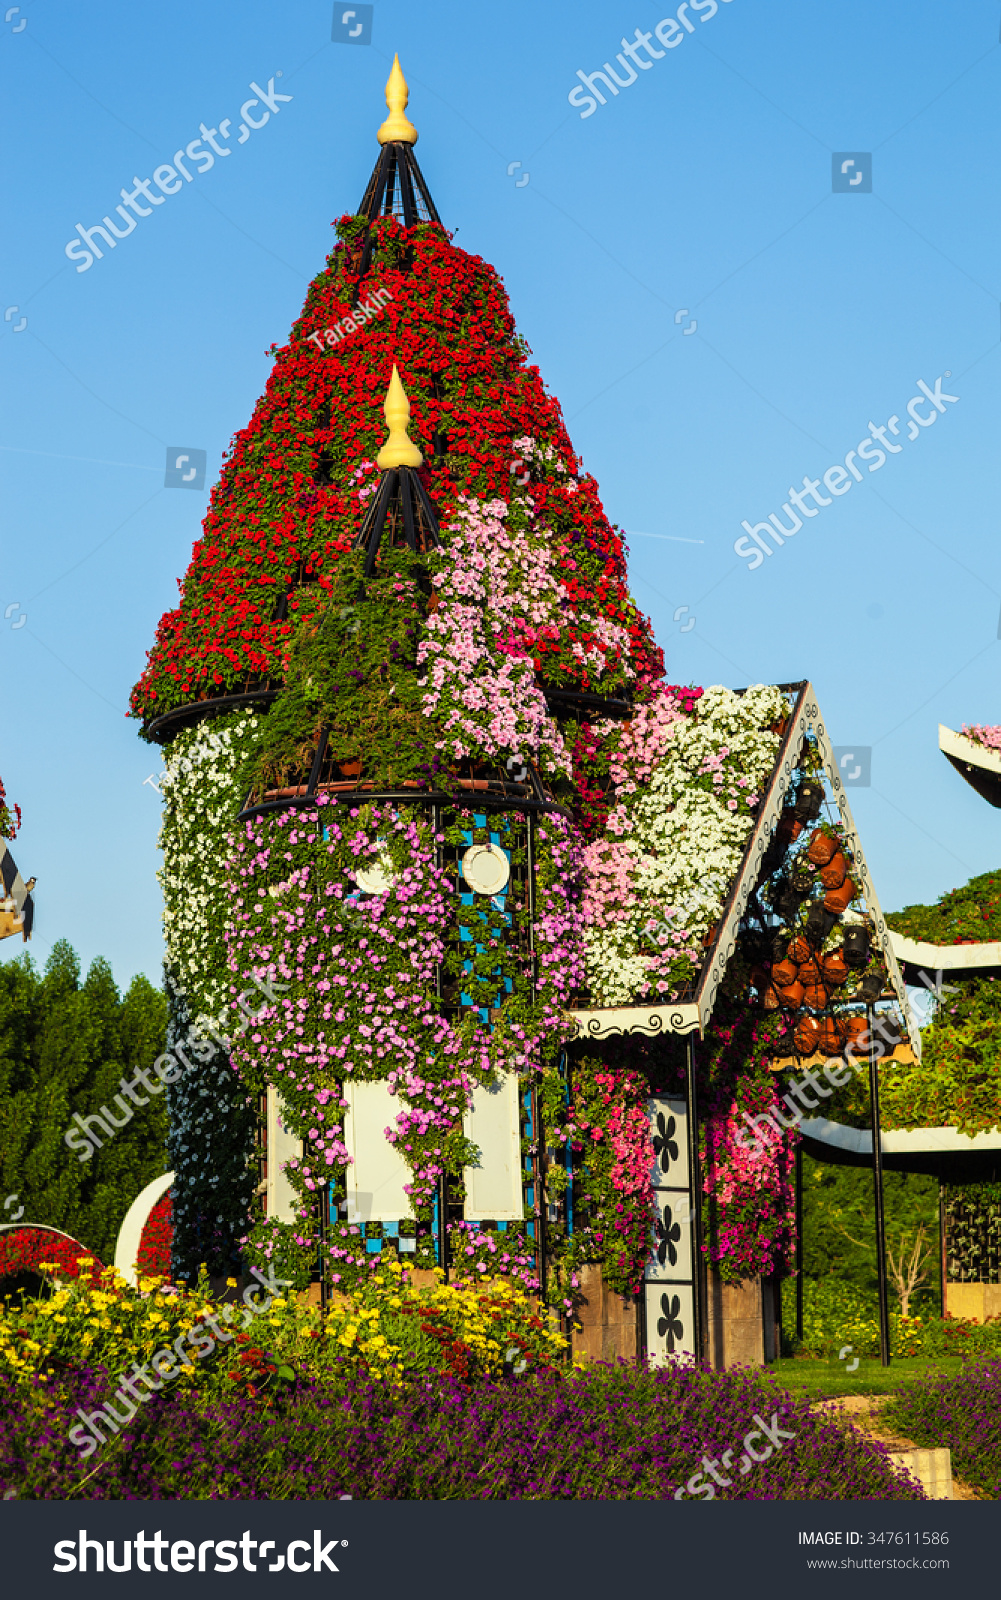 Flower Exhibition Dubai Miracle Garden 2015 Stock Photo (Edit Now ...